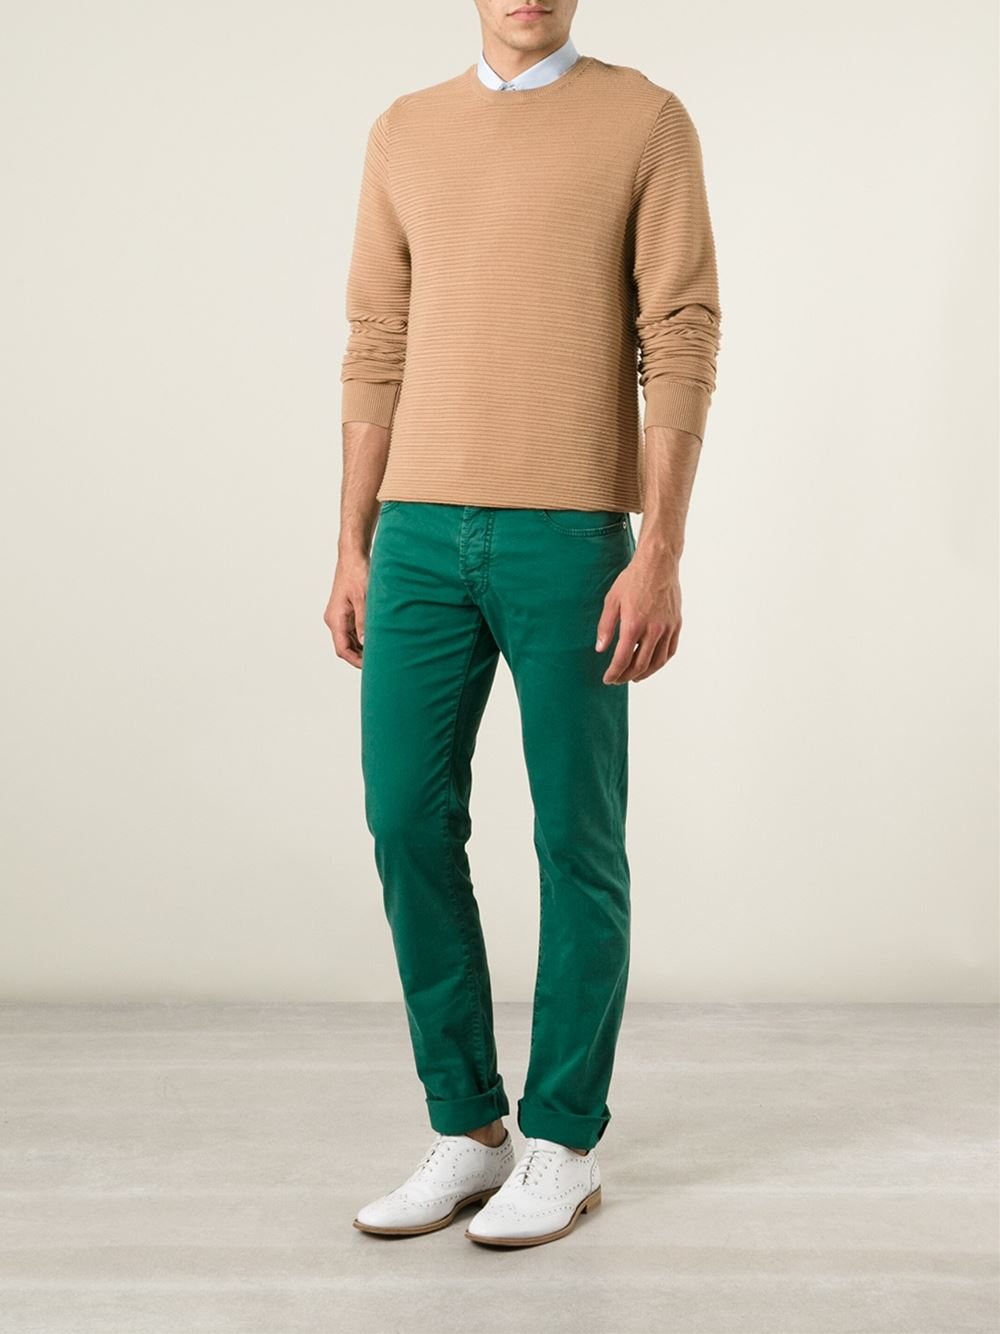 jacob cohen classic slim jeans in green for men lyst. Black Bedroom Furniture Sets. Home Design Ideas